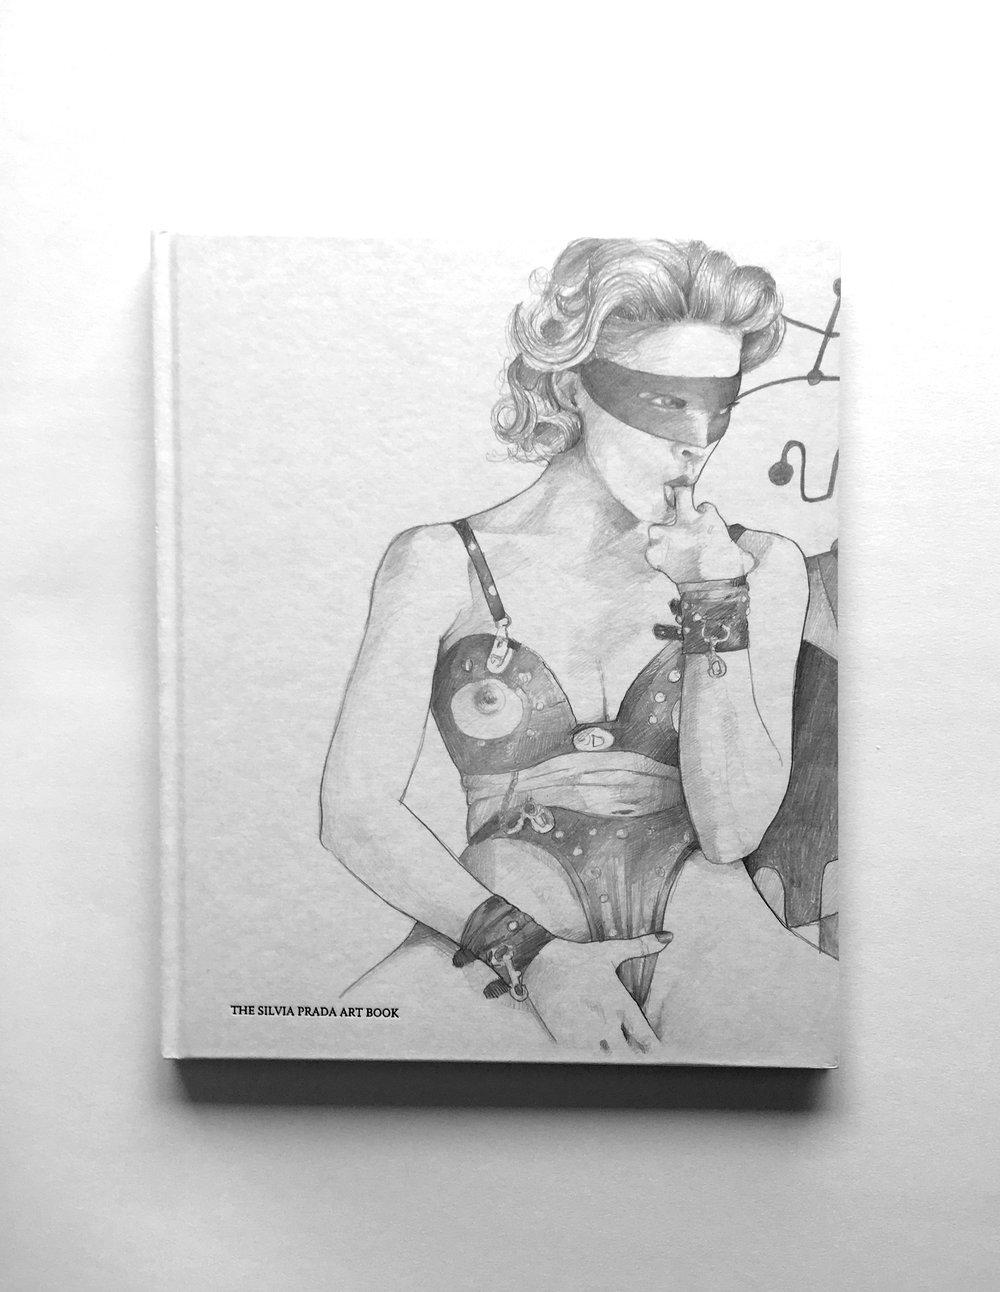 The Silvia Prada Art Book